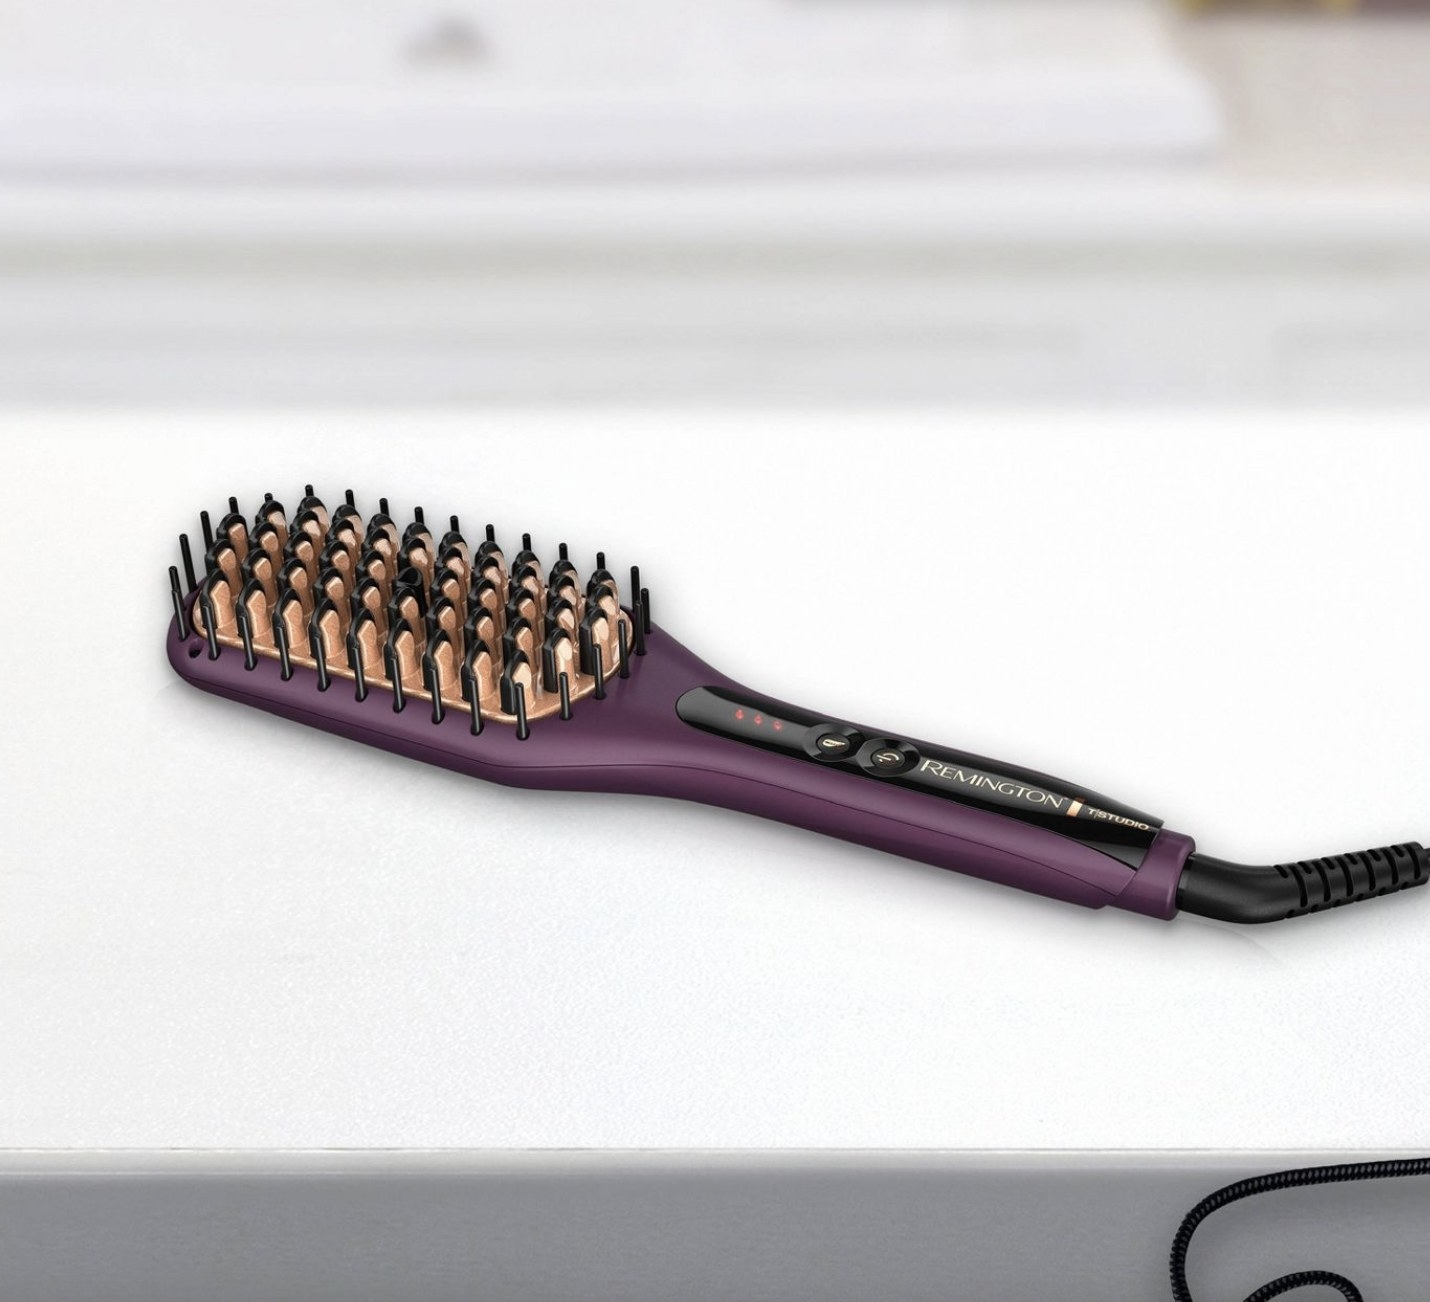 A heat straightening brush